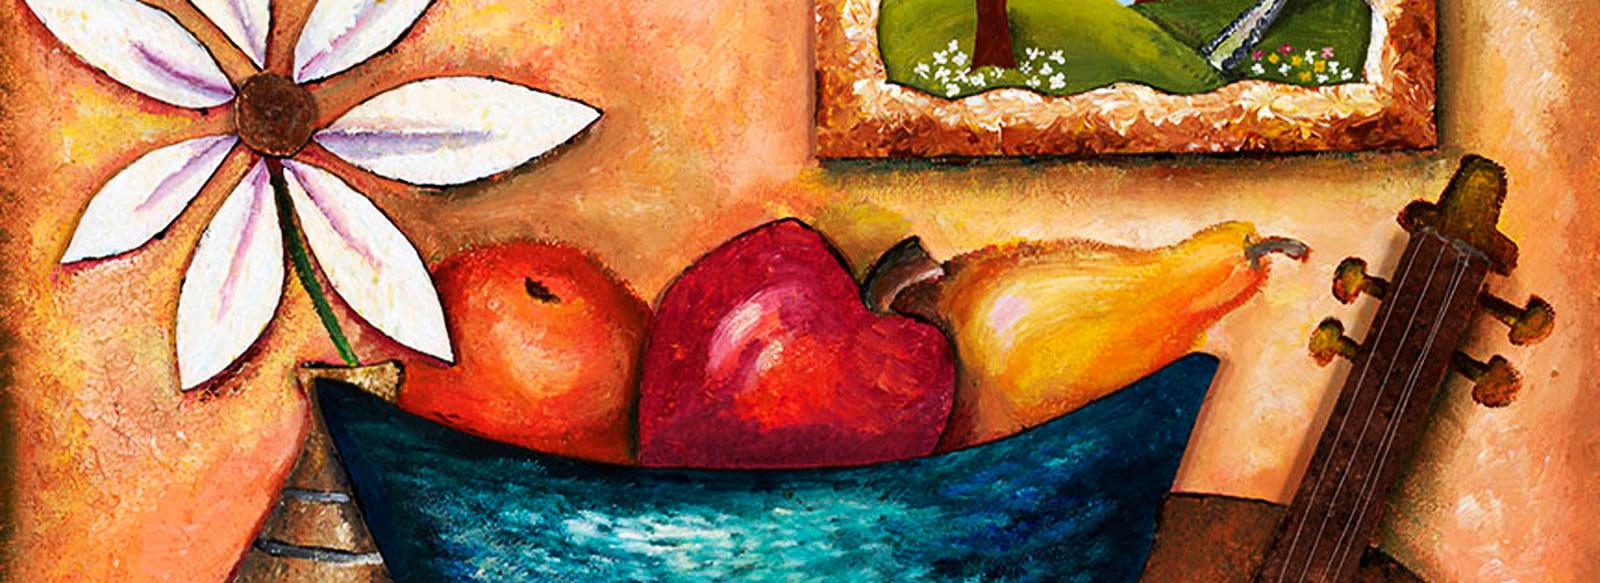 <div class='title'>           Fomby, Fruit Bowlbanner         </div>